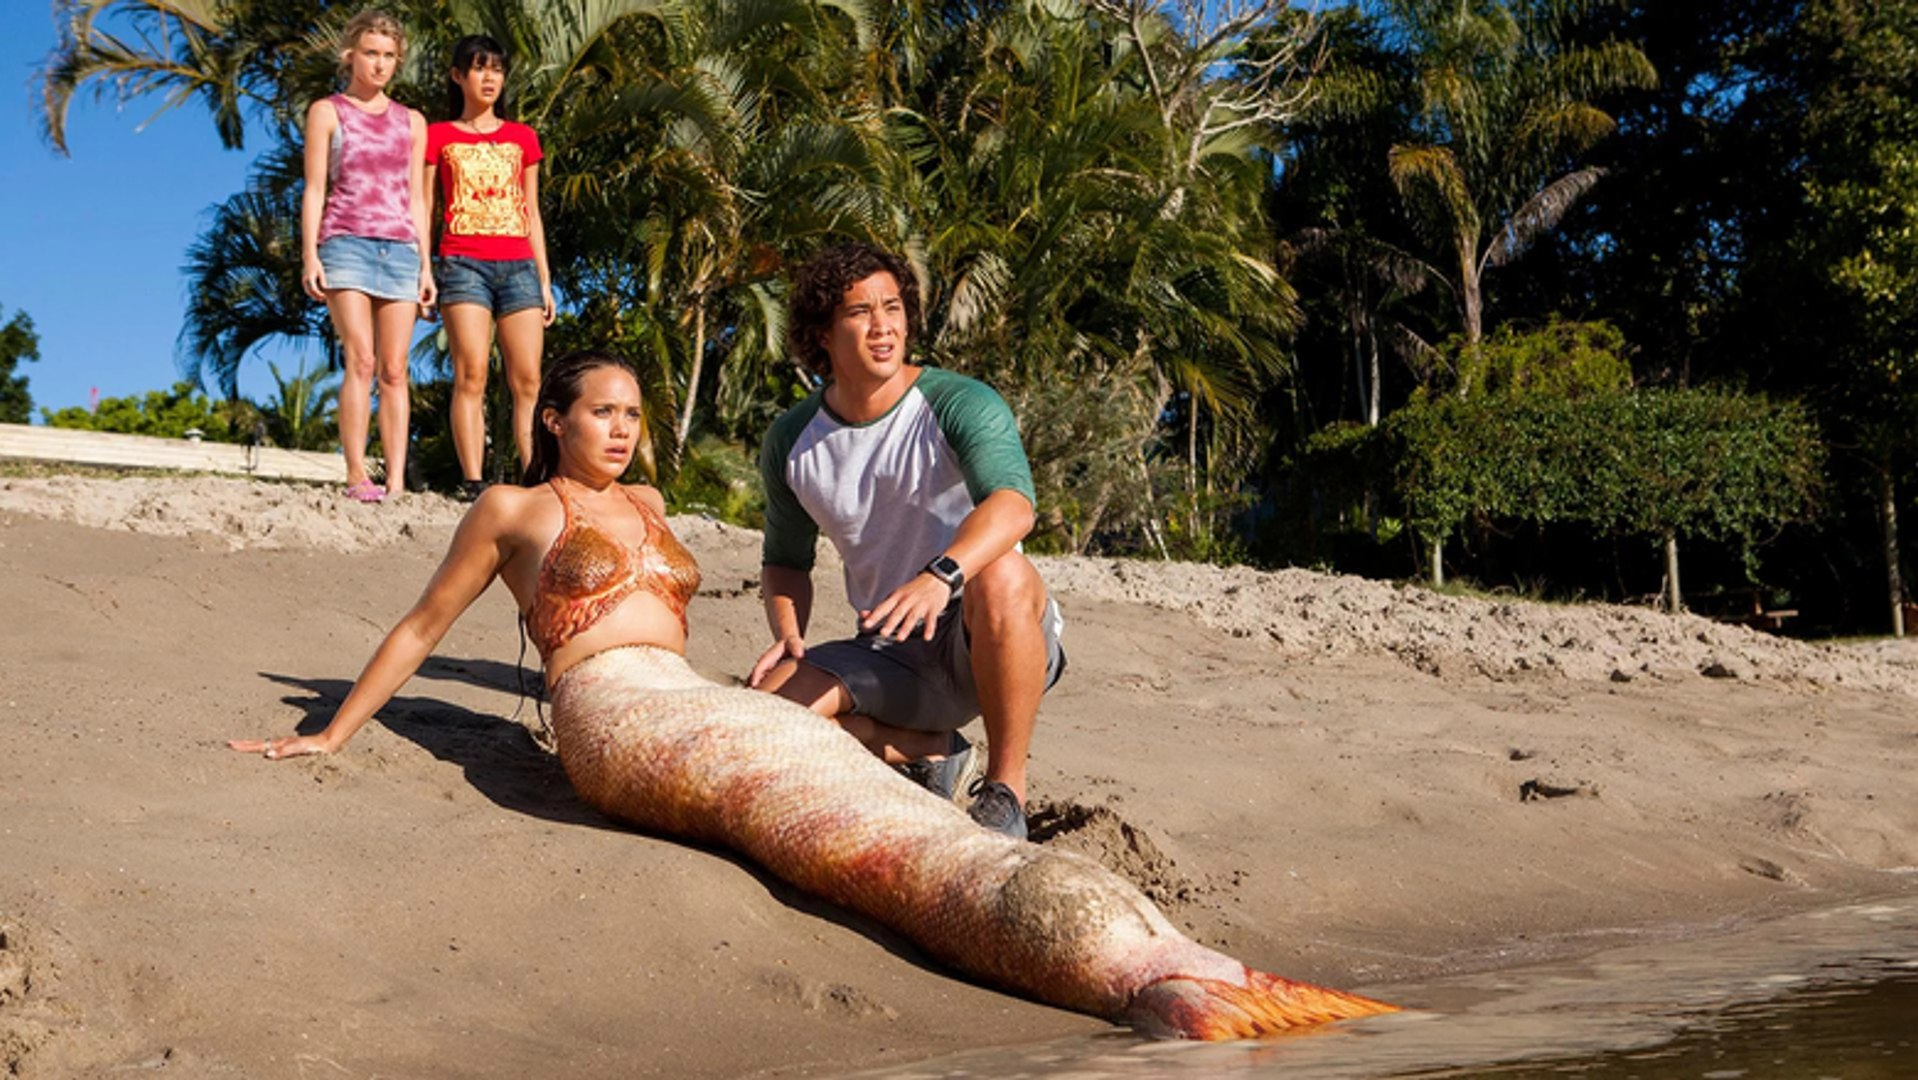 mako mermaids season 1 episode 23 videobull